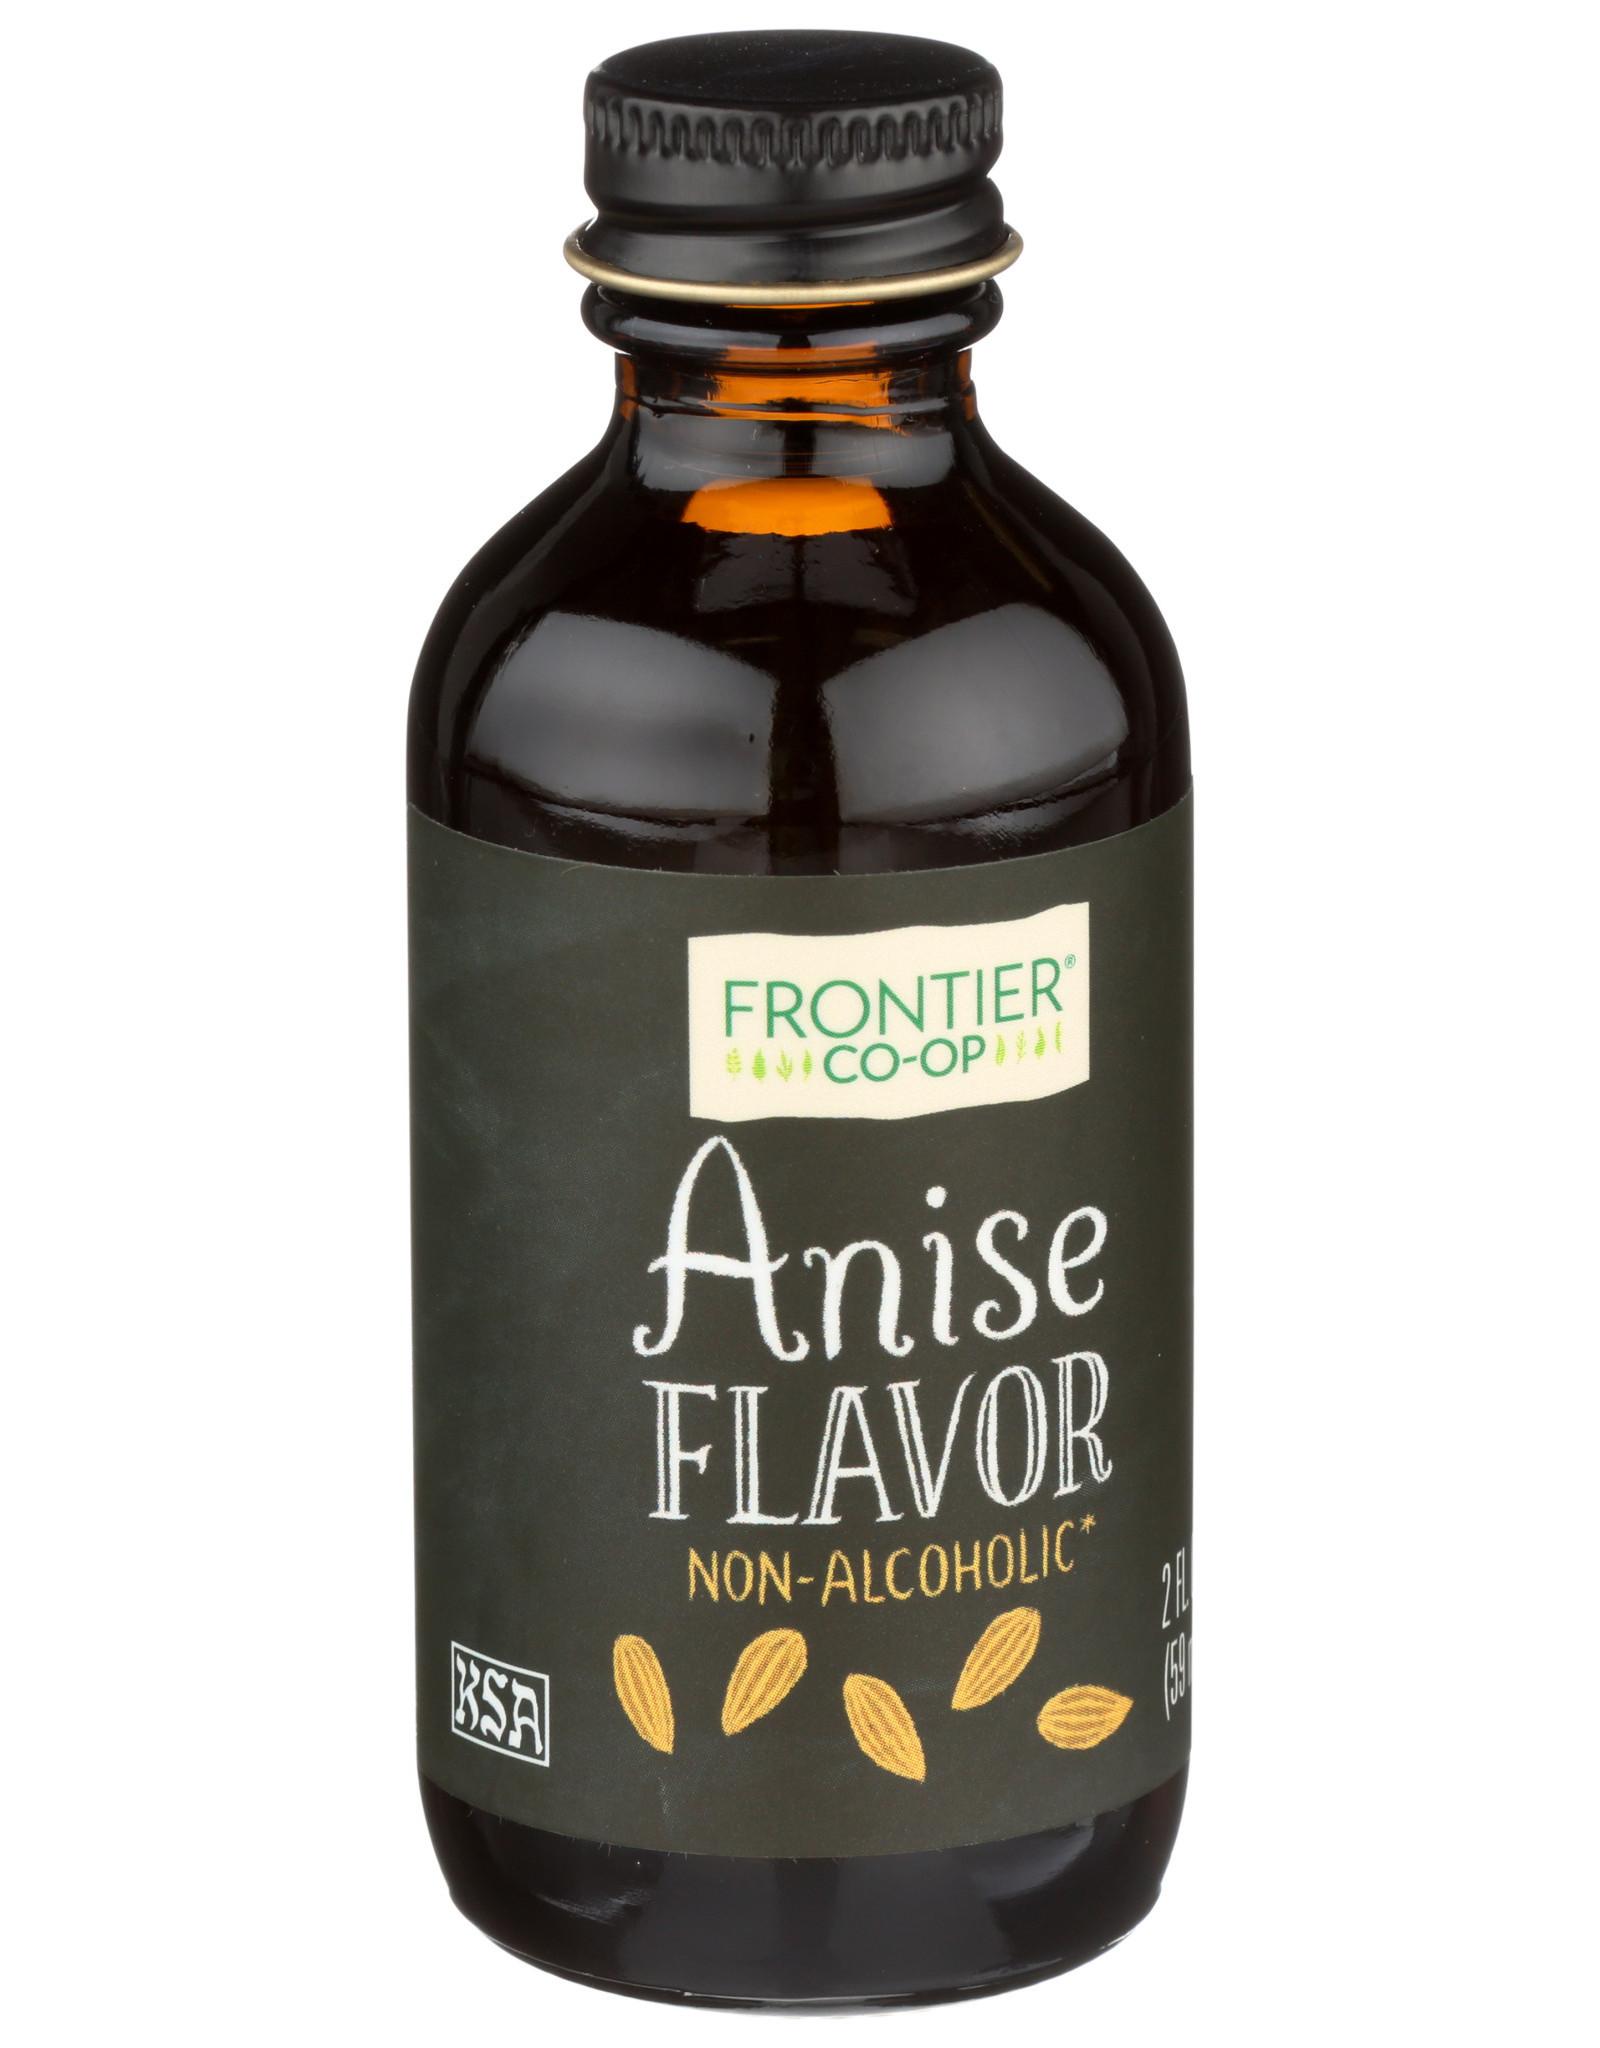 Frontier Anise Flavor 2 oz